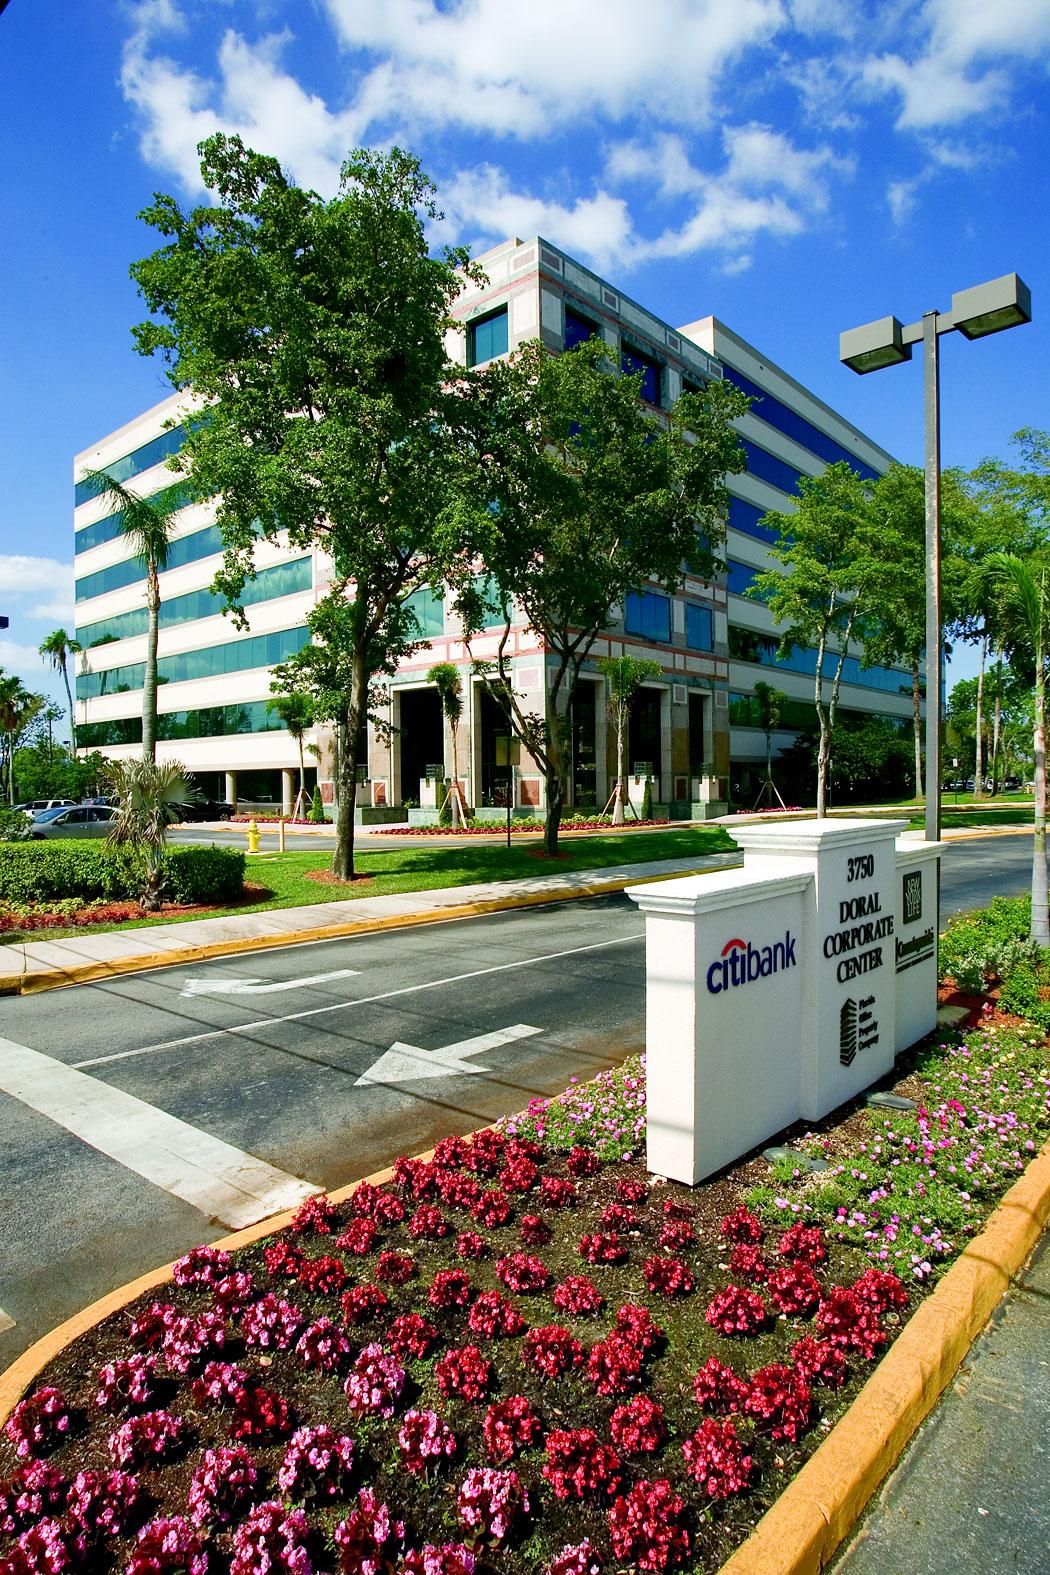 Doral Corporate Center